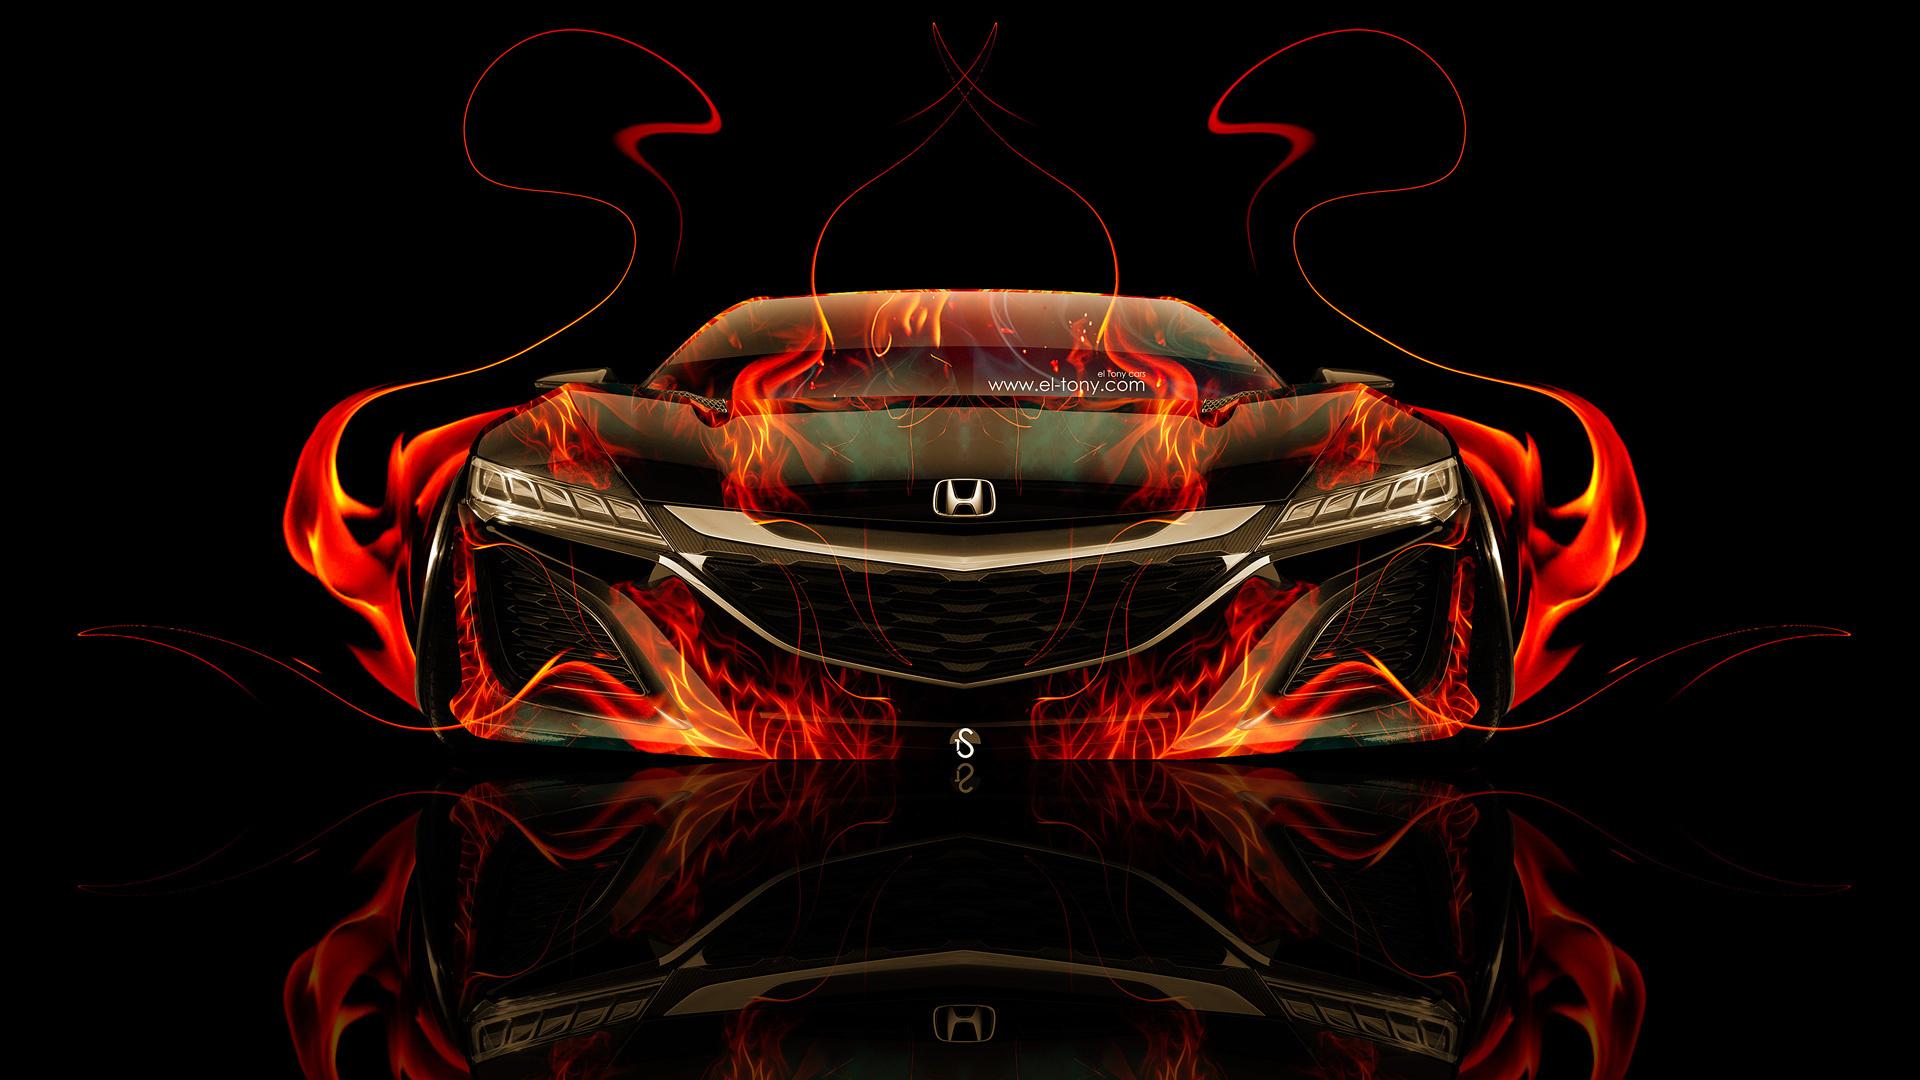 Wallpaper Cars Photo Picture Tony Kokhan Honda Nsx Fire